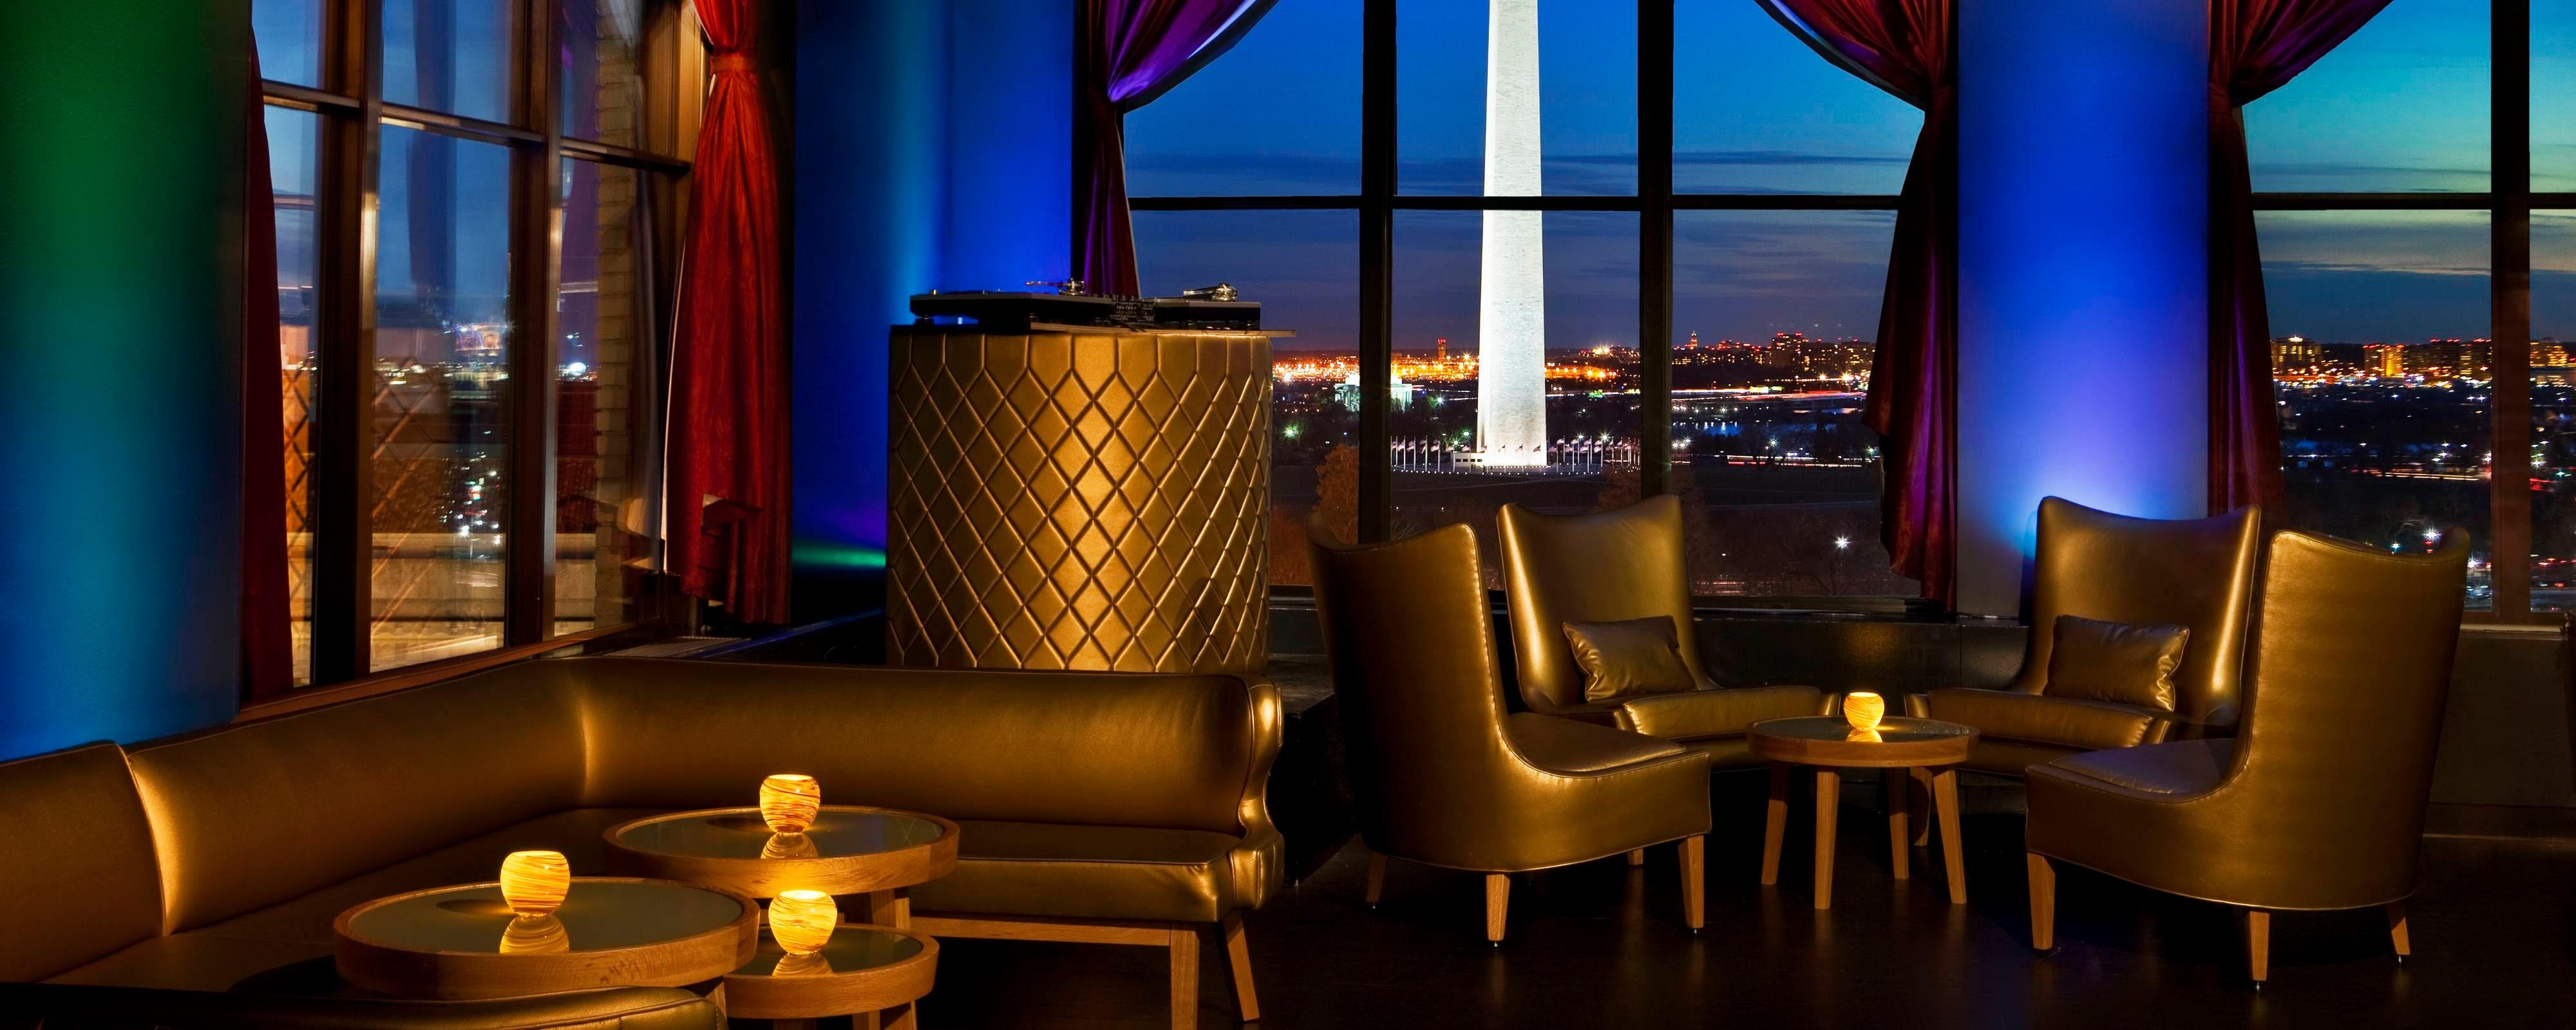 the living room with sky bar wall lights for w washington d c spg pov rooftop